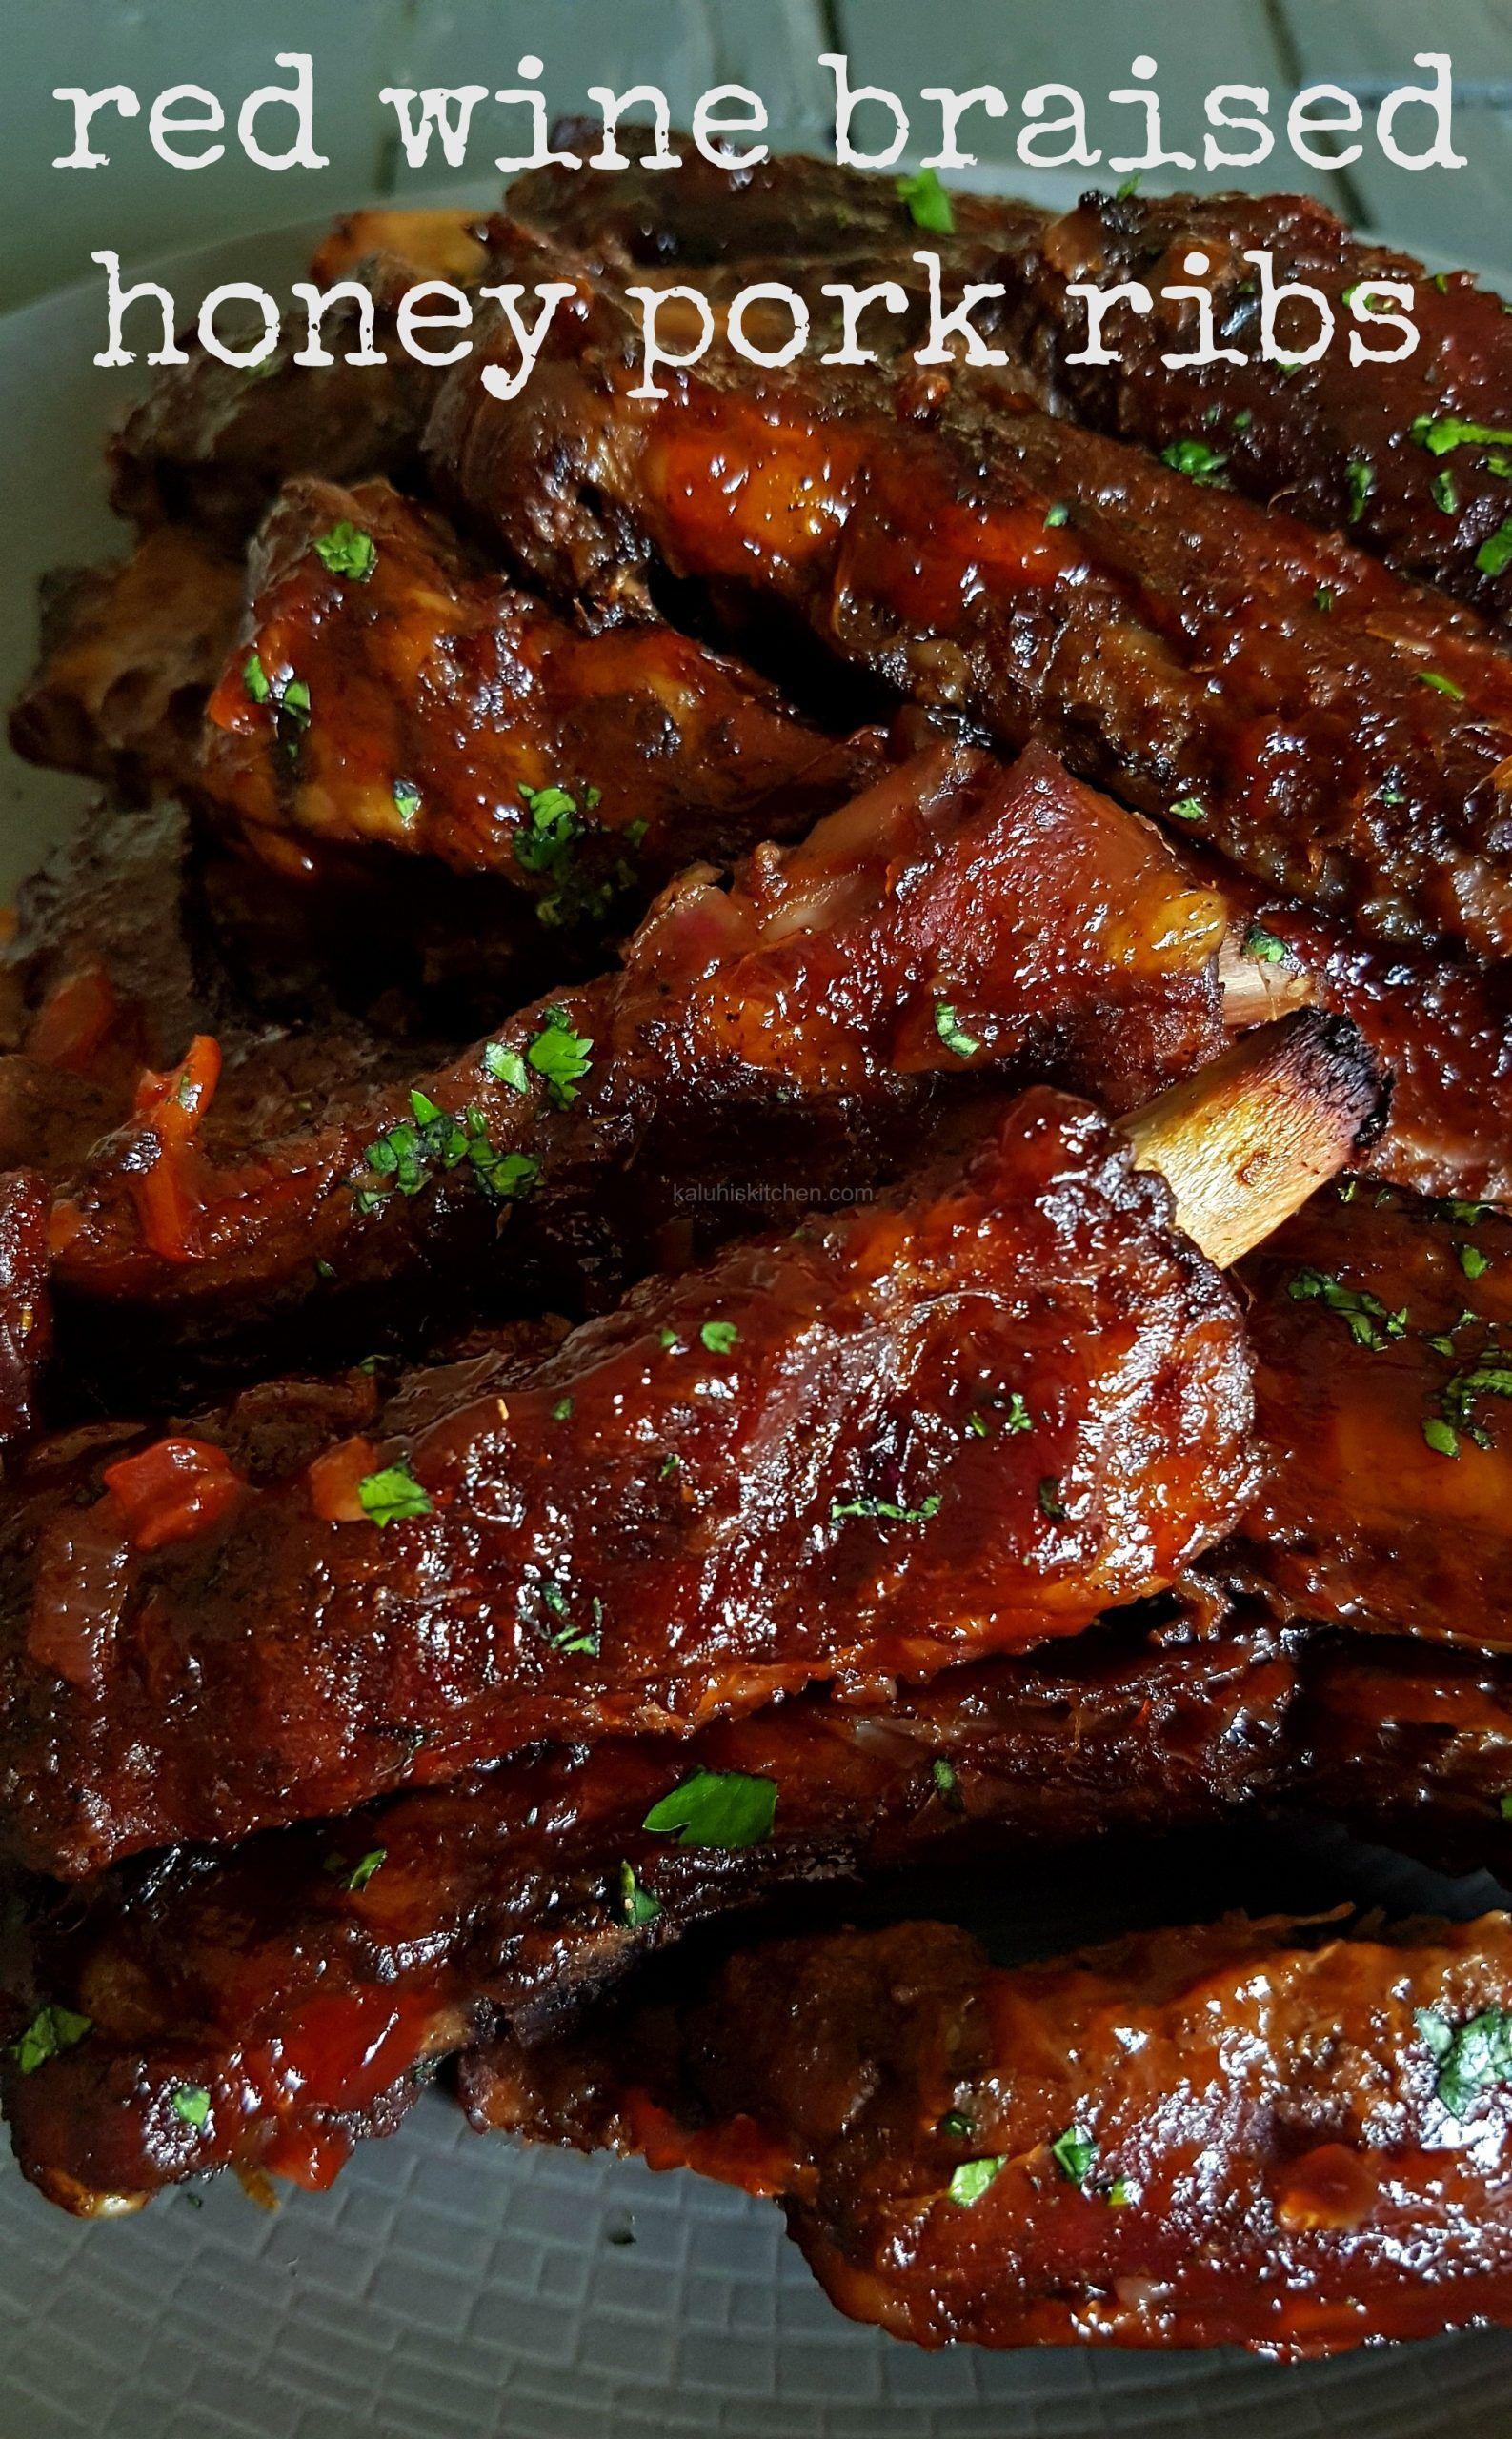 Budget Recipes Braised Braised Pork Ribs Pork Ribs In The Crockpot Boneless Pork Rib Marinade Overnight Instant Pot In 2020 Braised Pork Ribs Pork Ribs Honey Pork